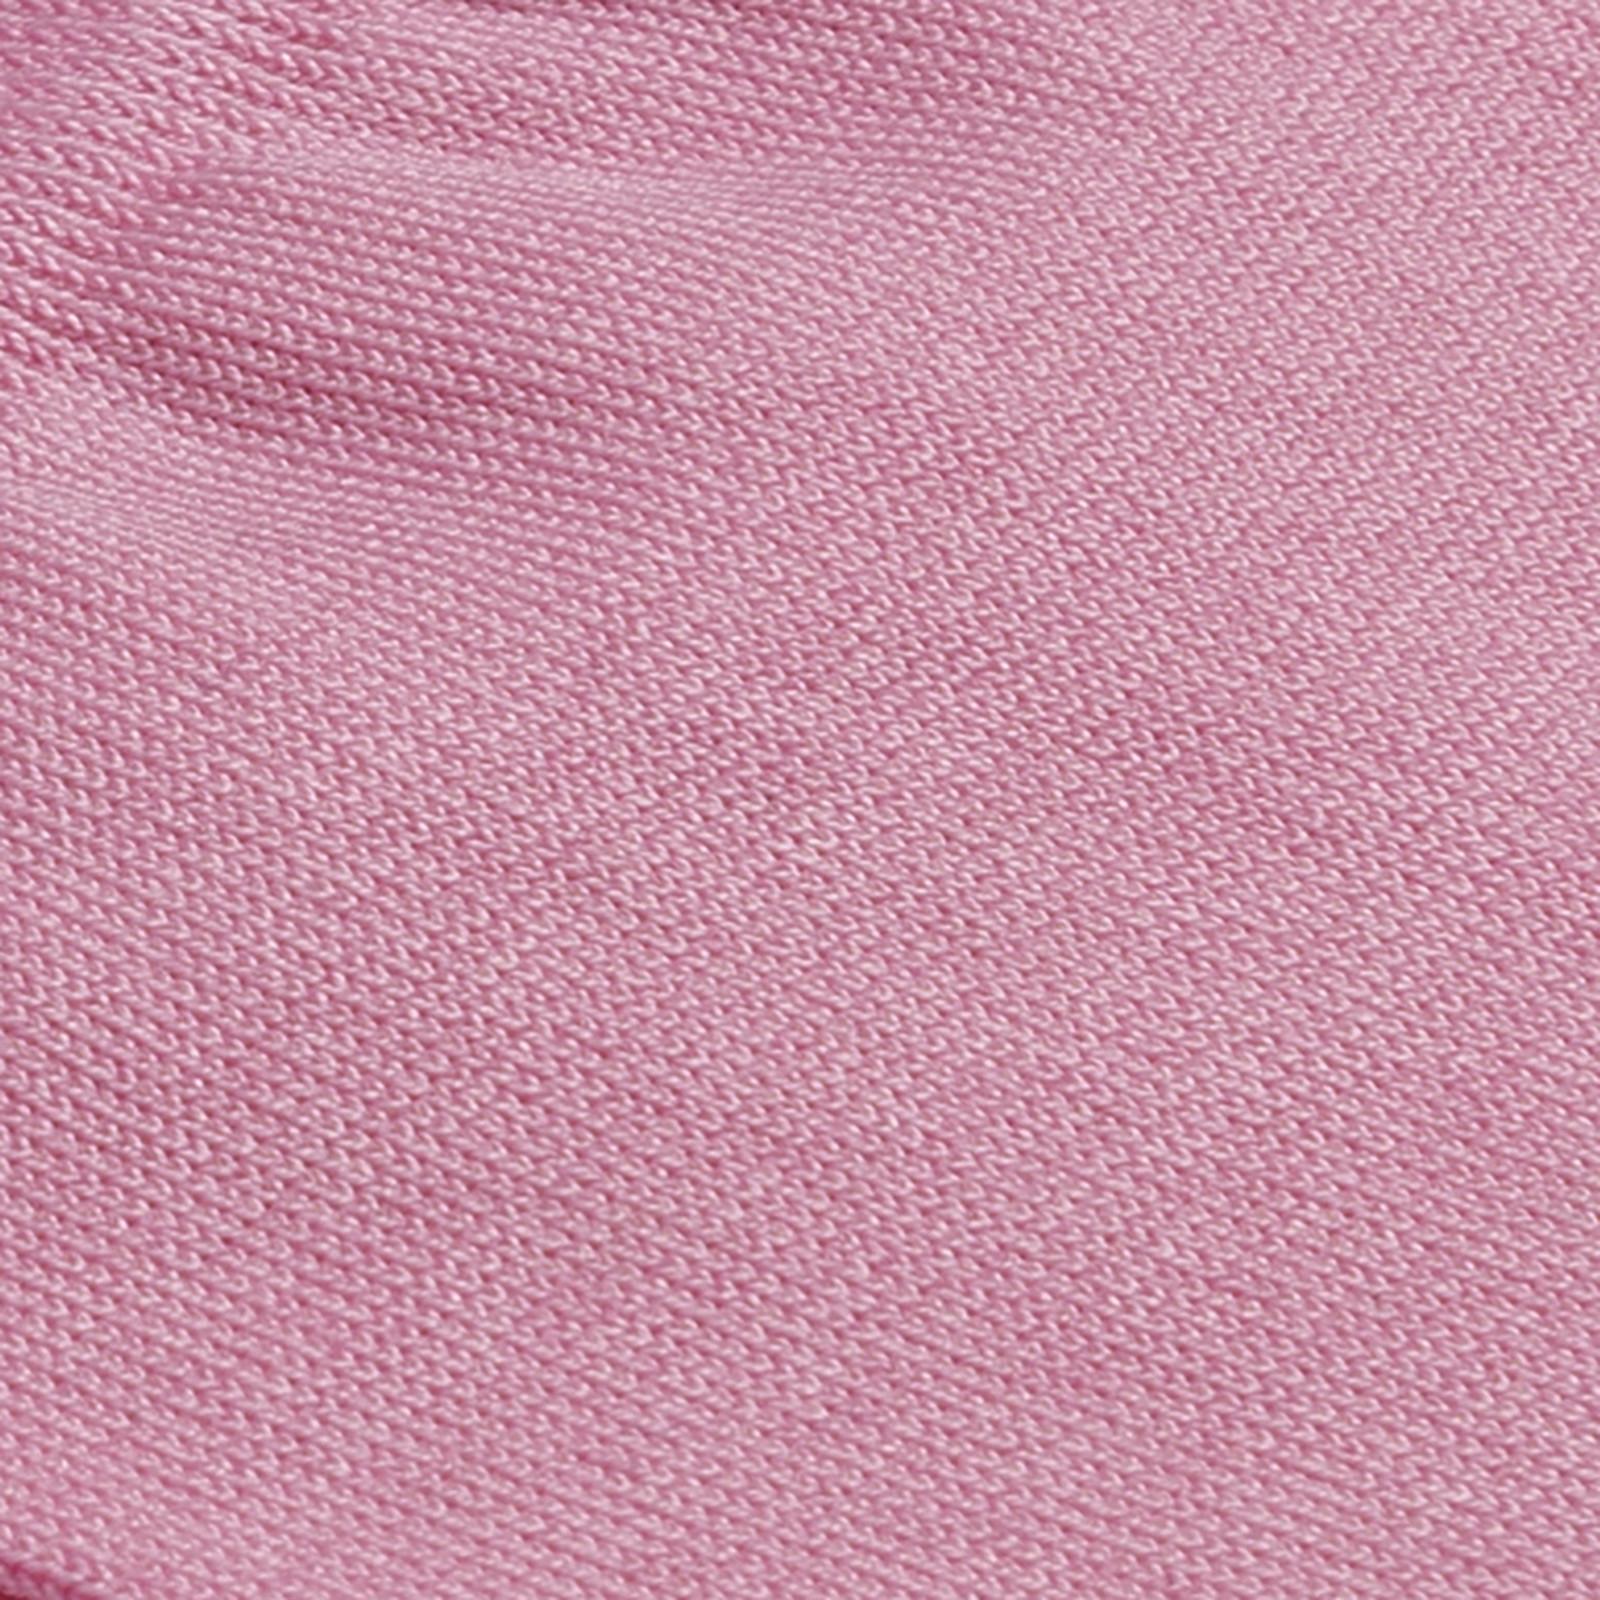 Carlo Lanza Pink socks